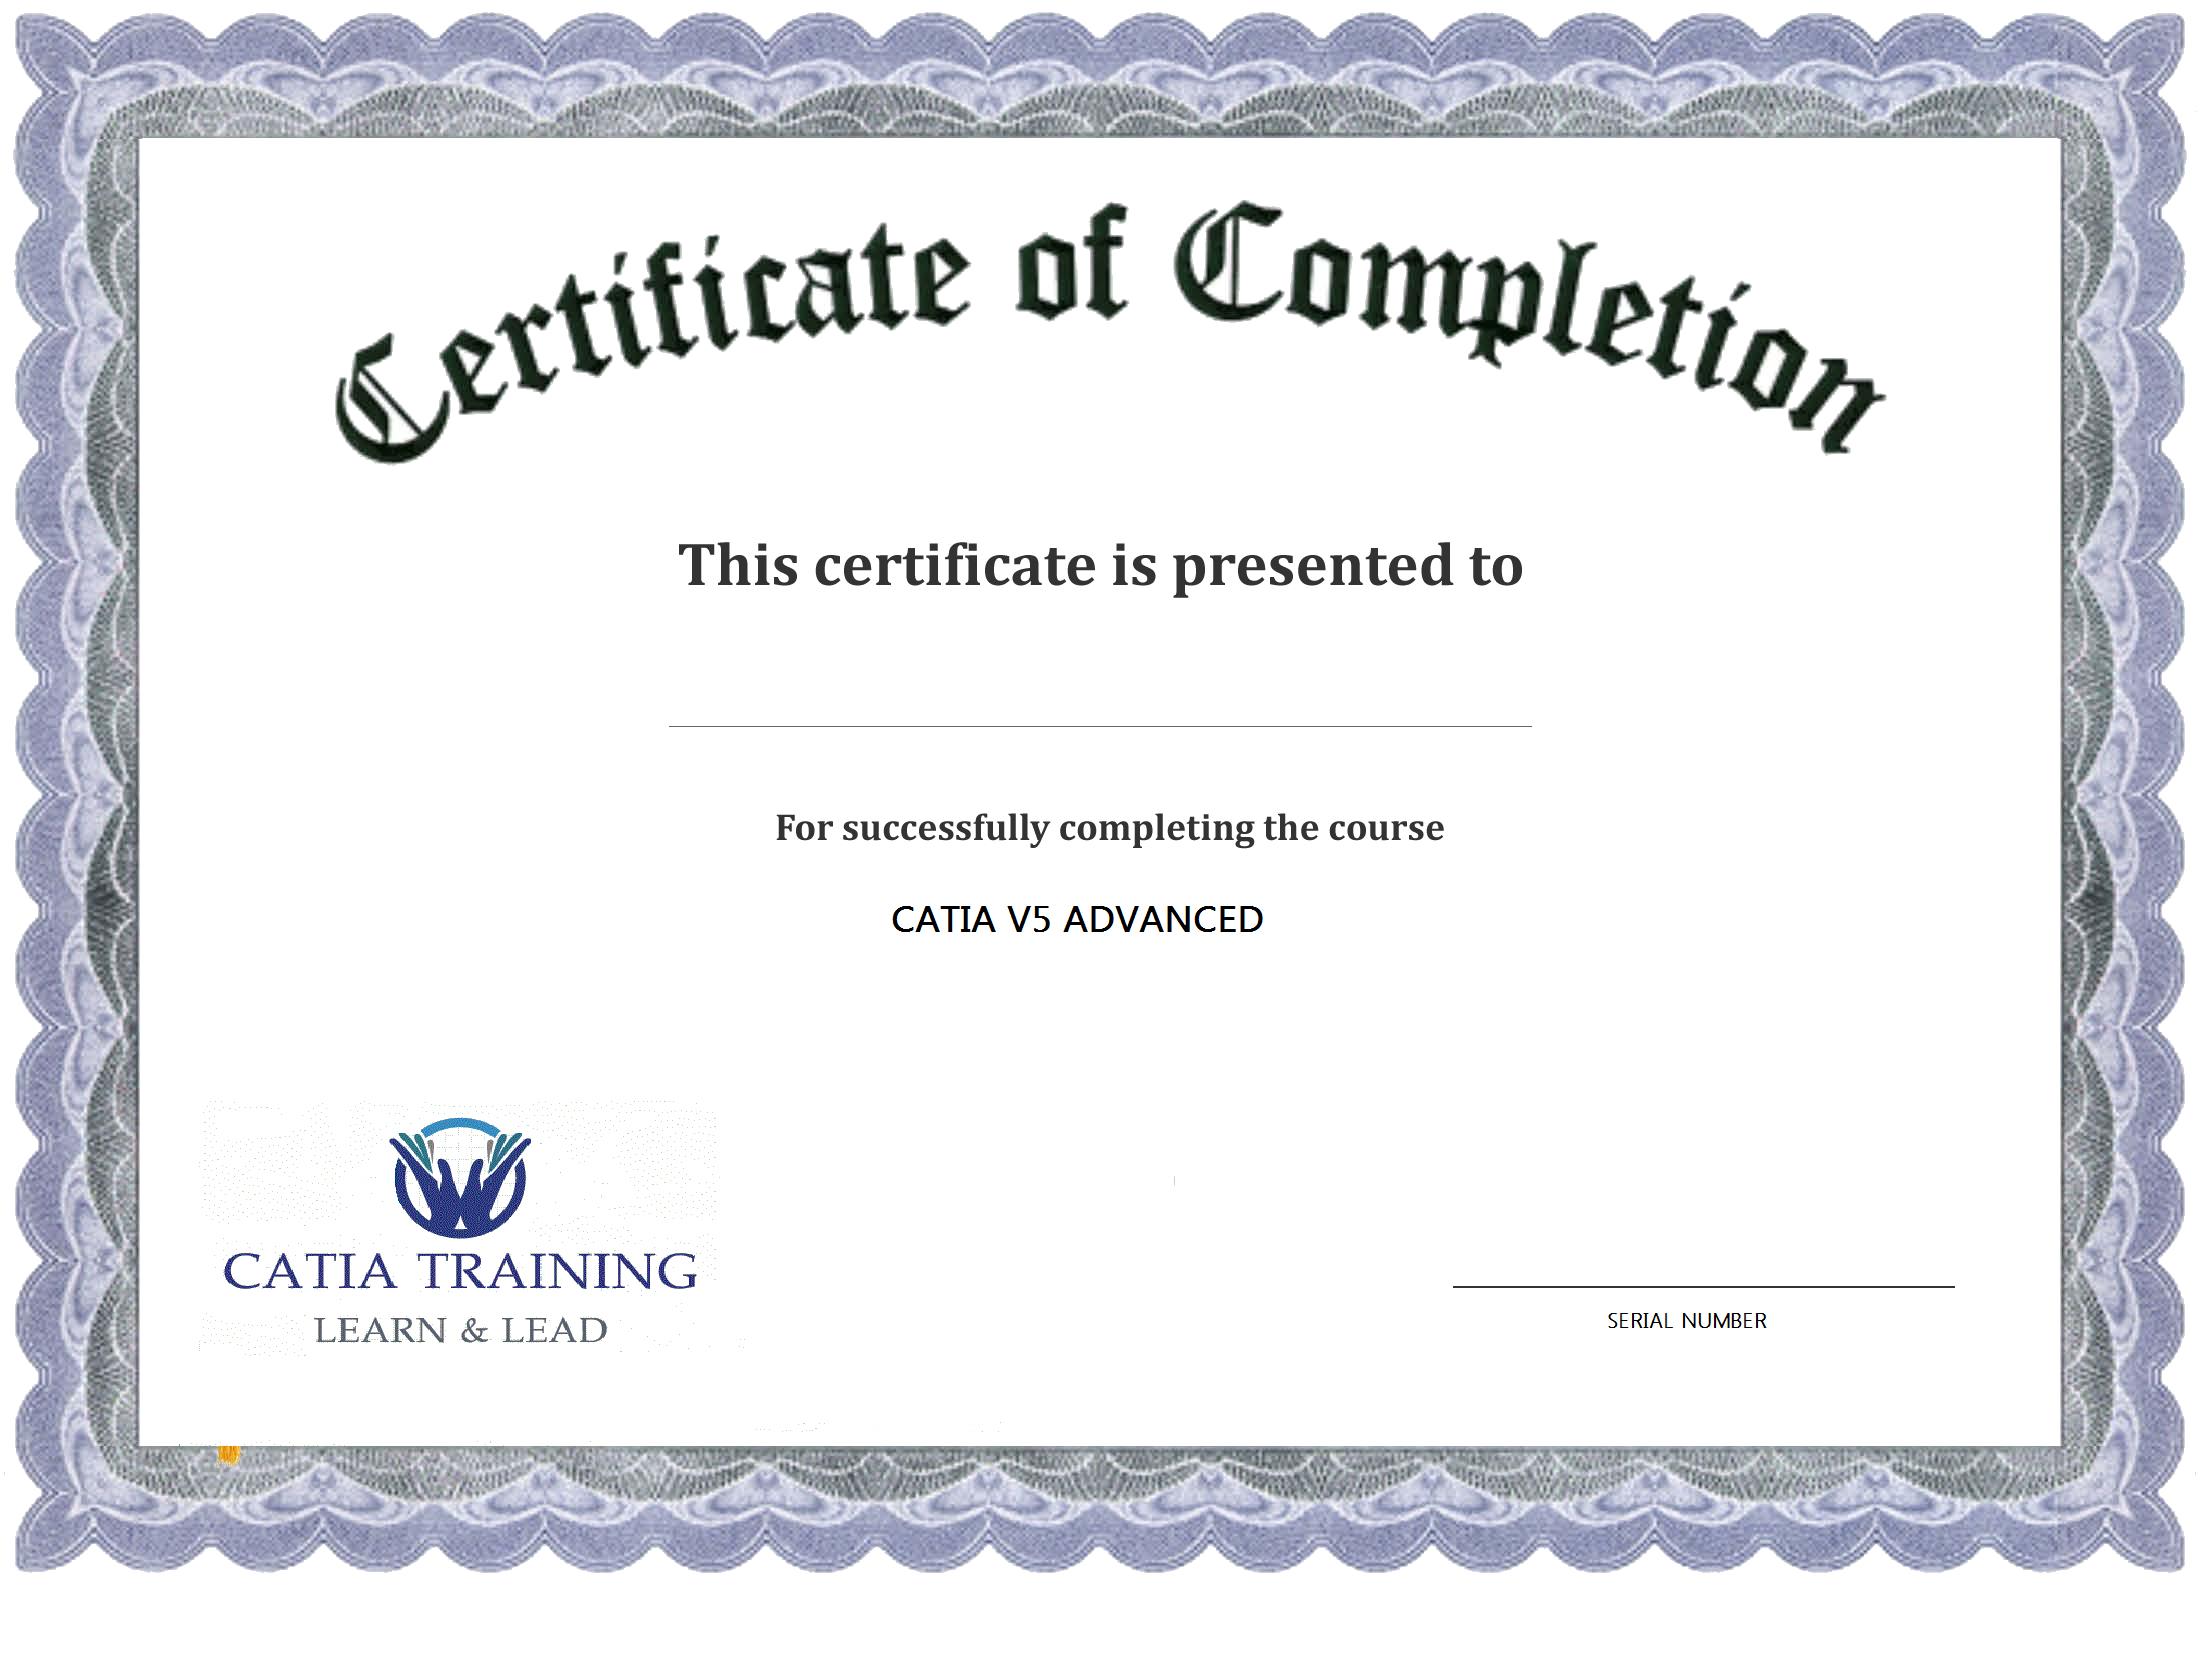 Pinpicshy Photoshop Resource On Template   Pinterest - Free Printable Blank Certificates Of Achievement